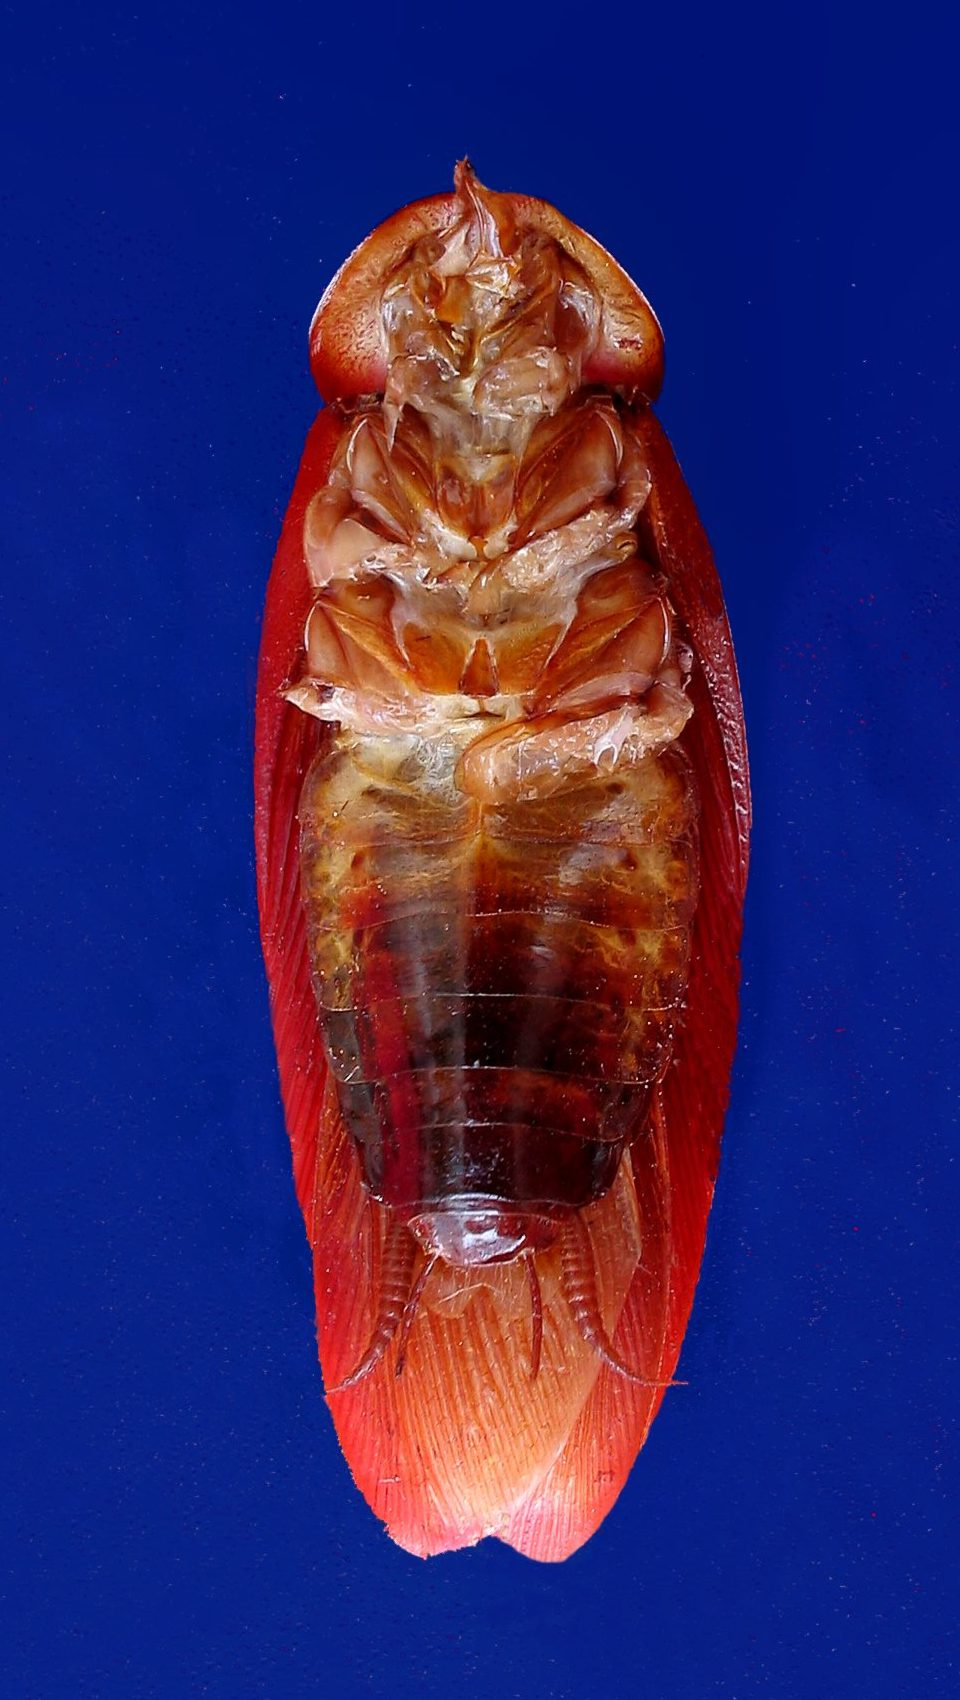 Literature review on intestinal parasites of man